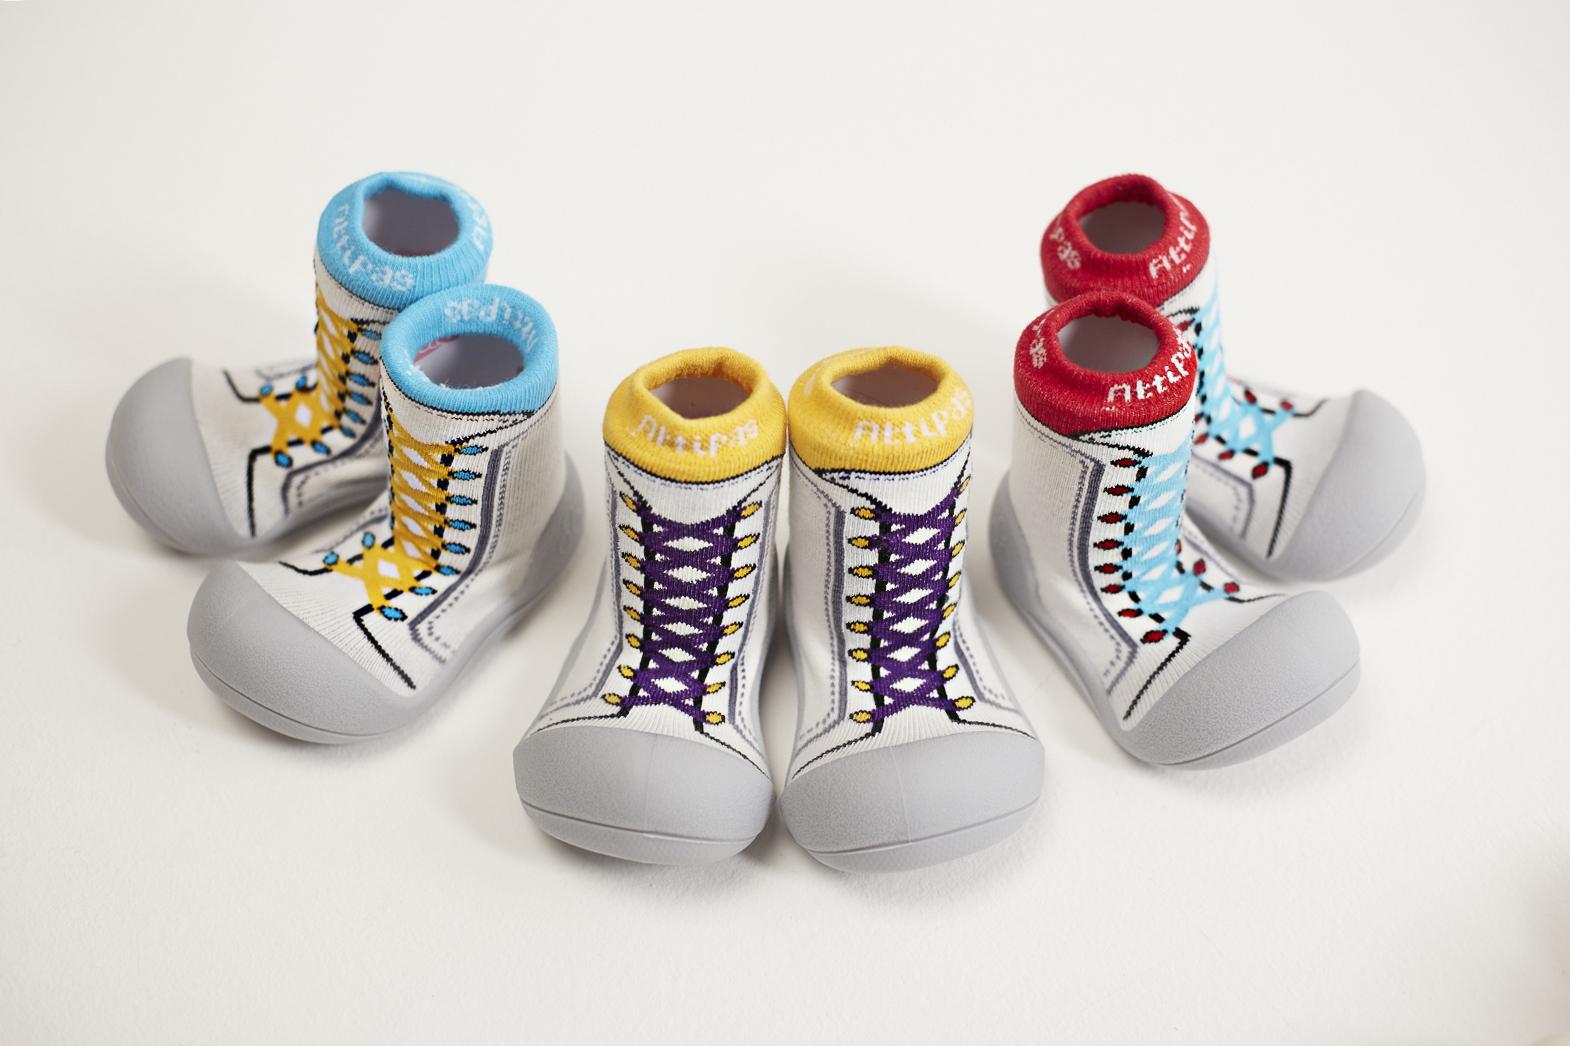 Attipas New Sneaker